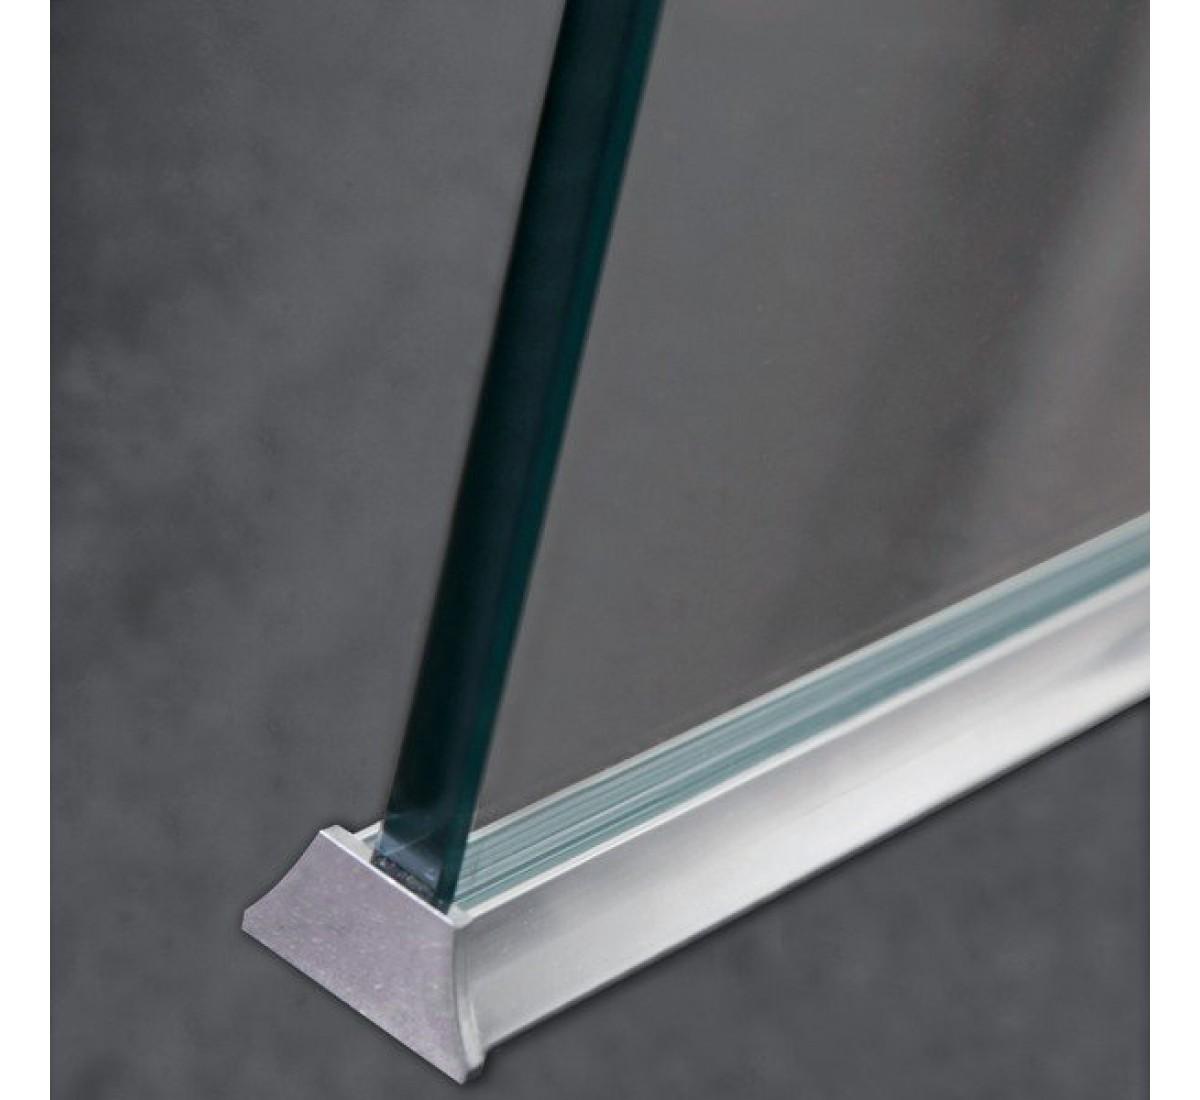 Wet room shower screen floor channel aluminium sealing strip